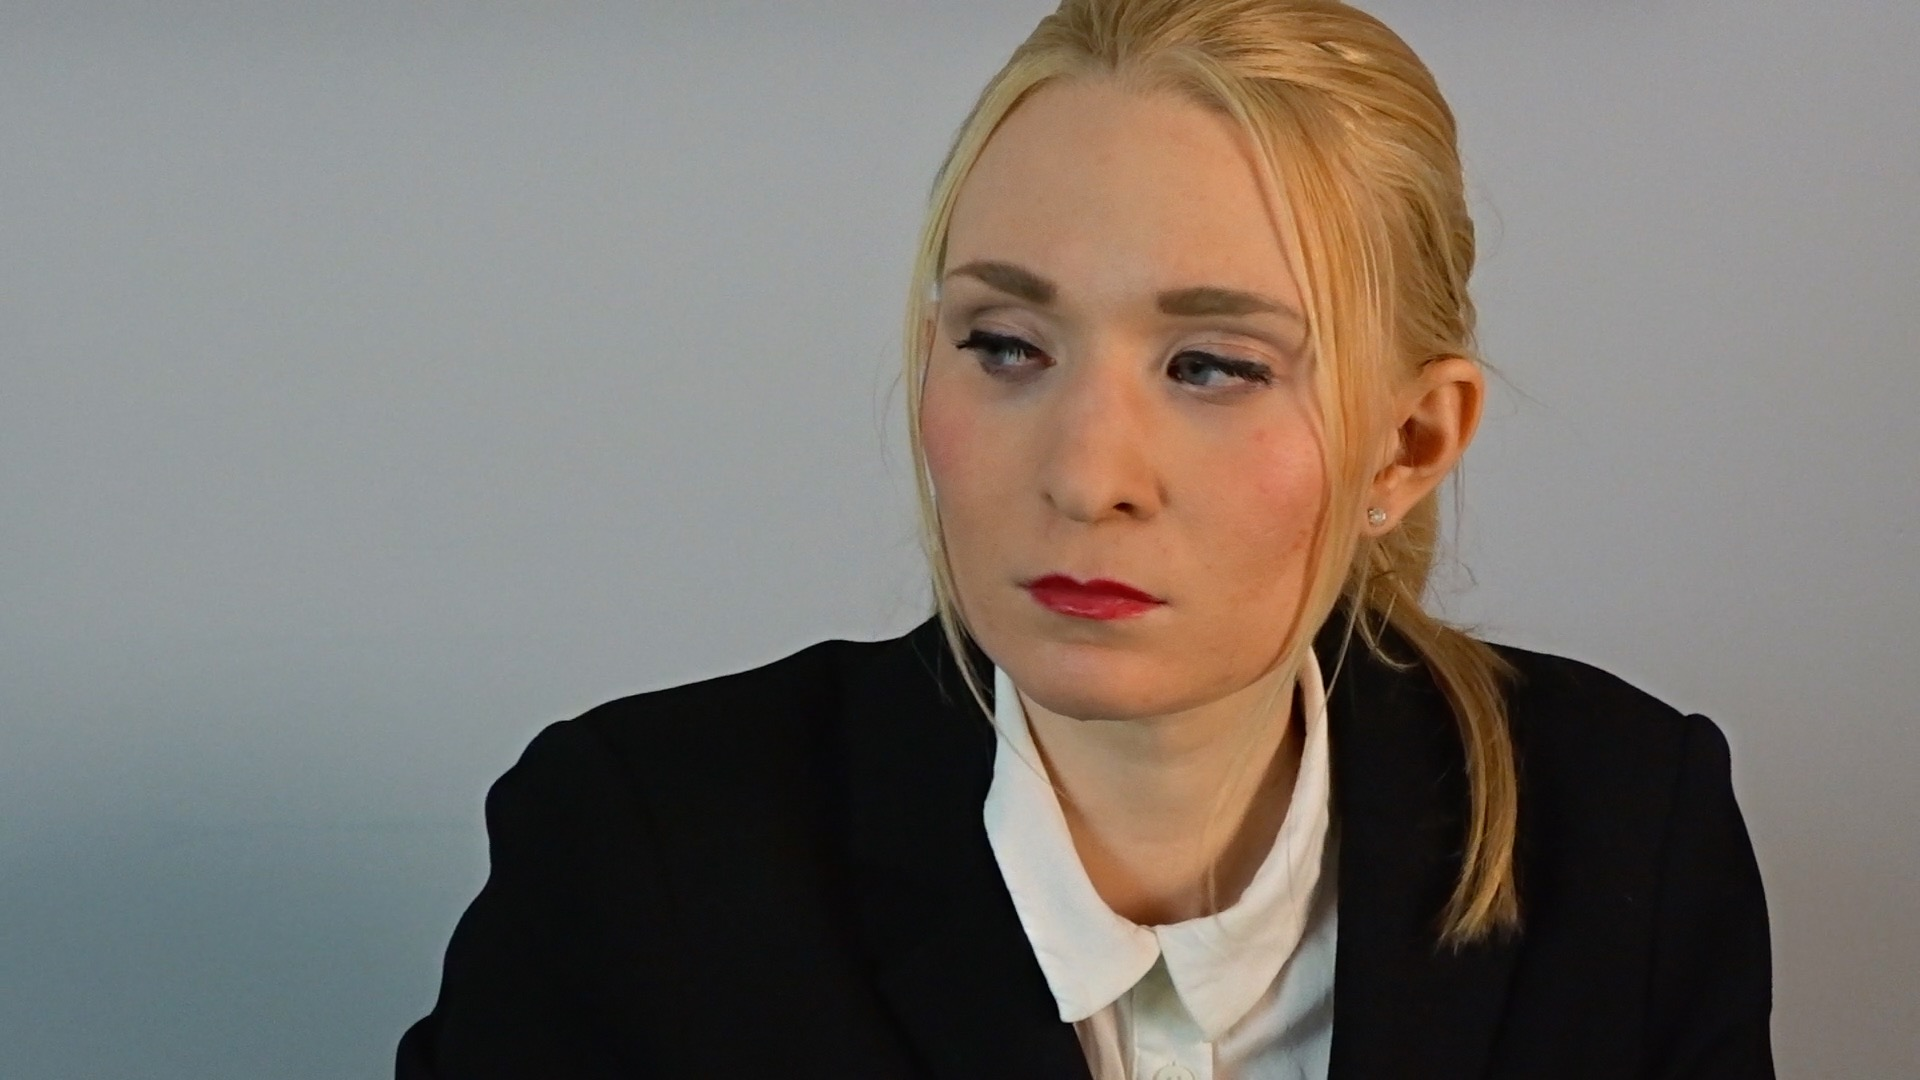 Janelle1